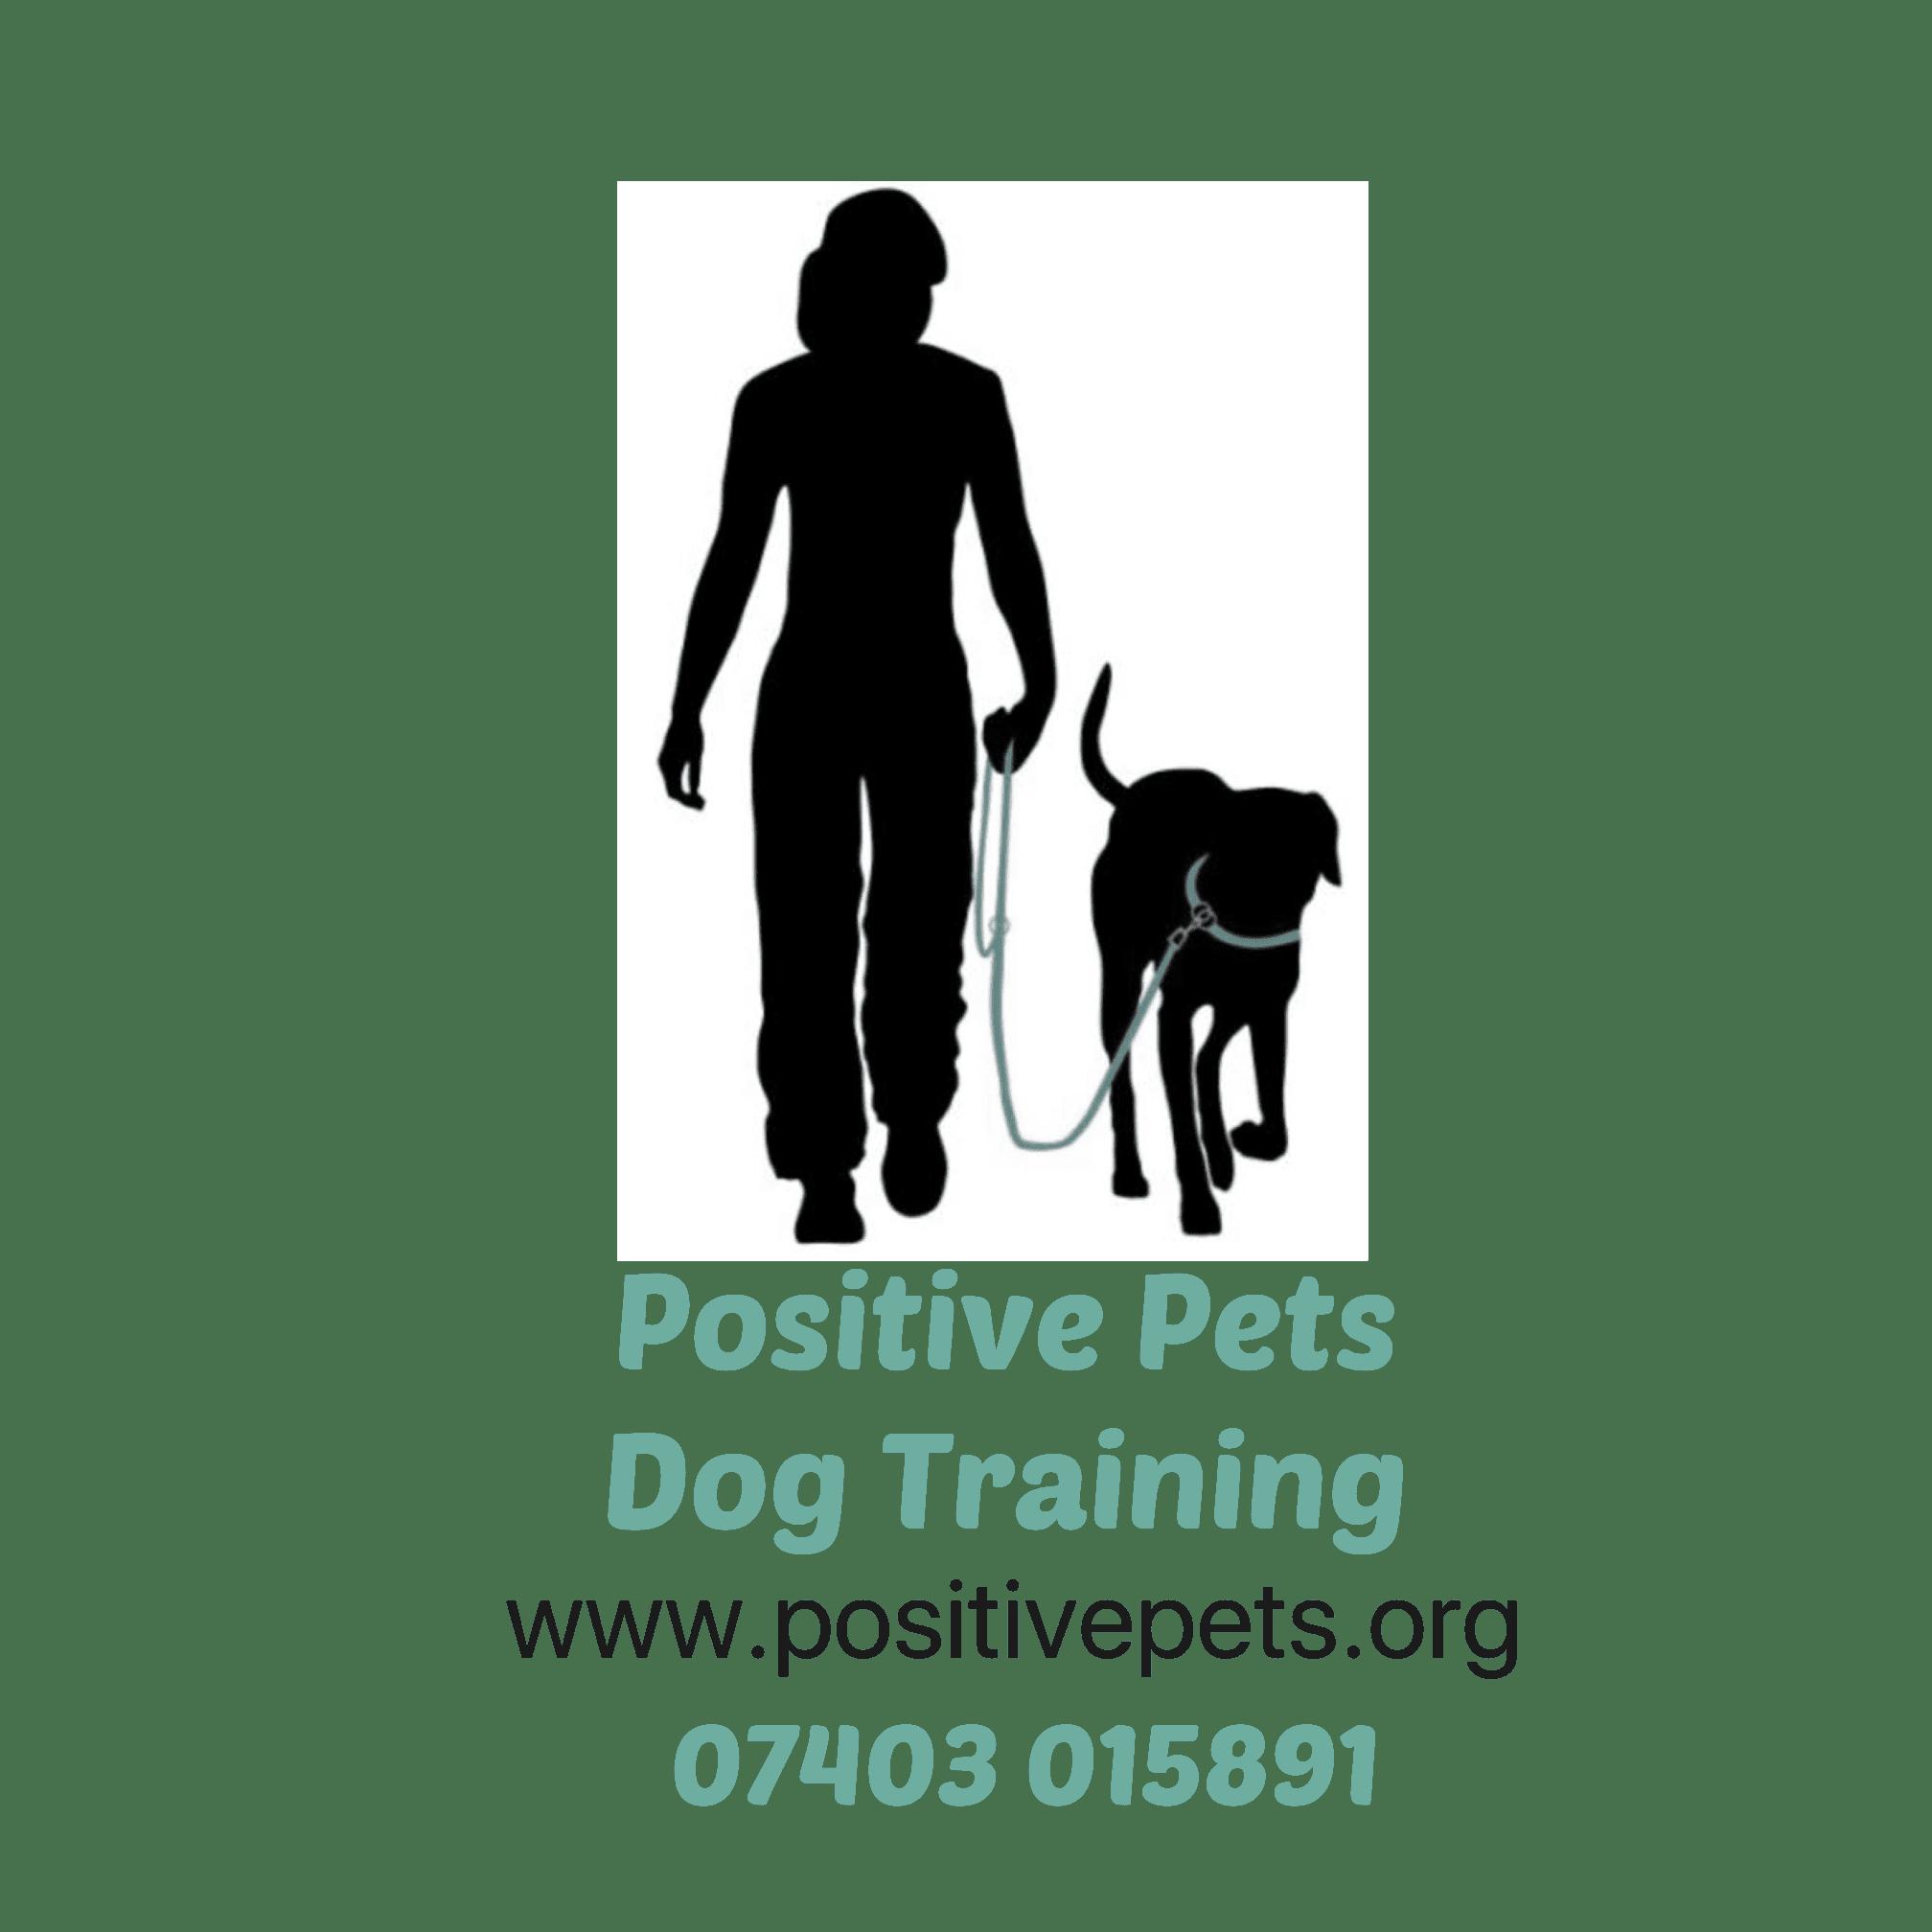 Positive Pets Dog Training Bucks